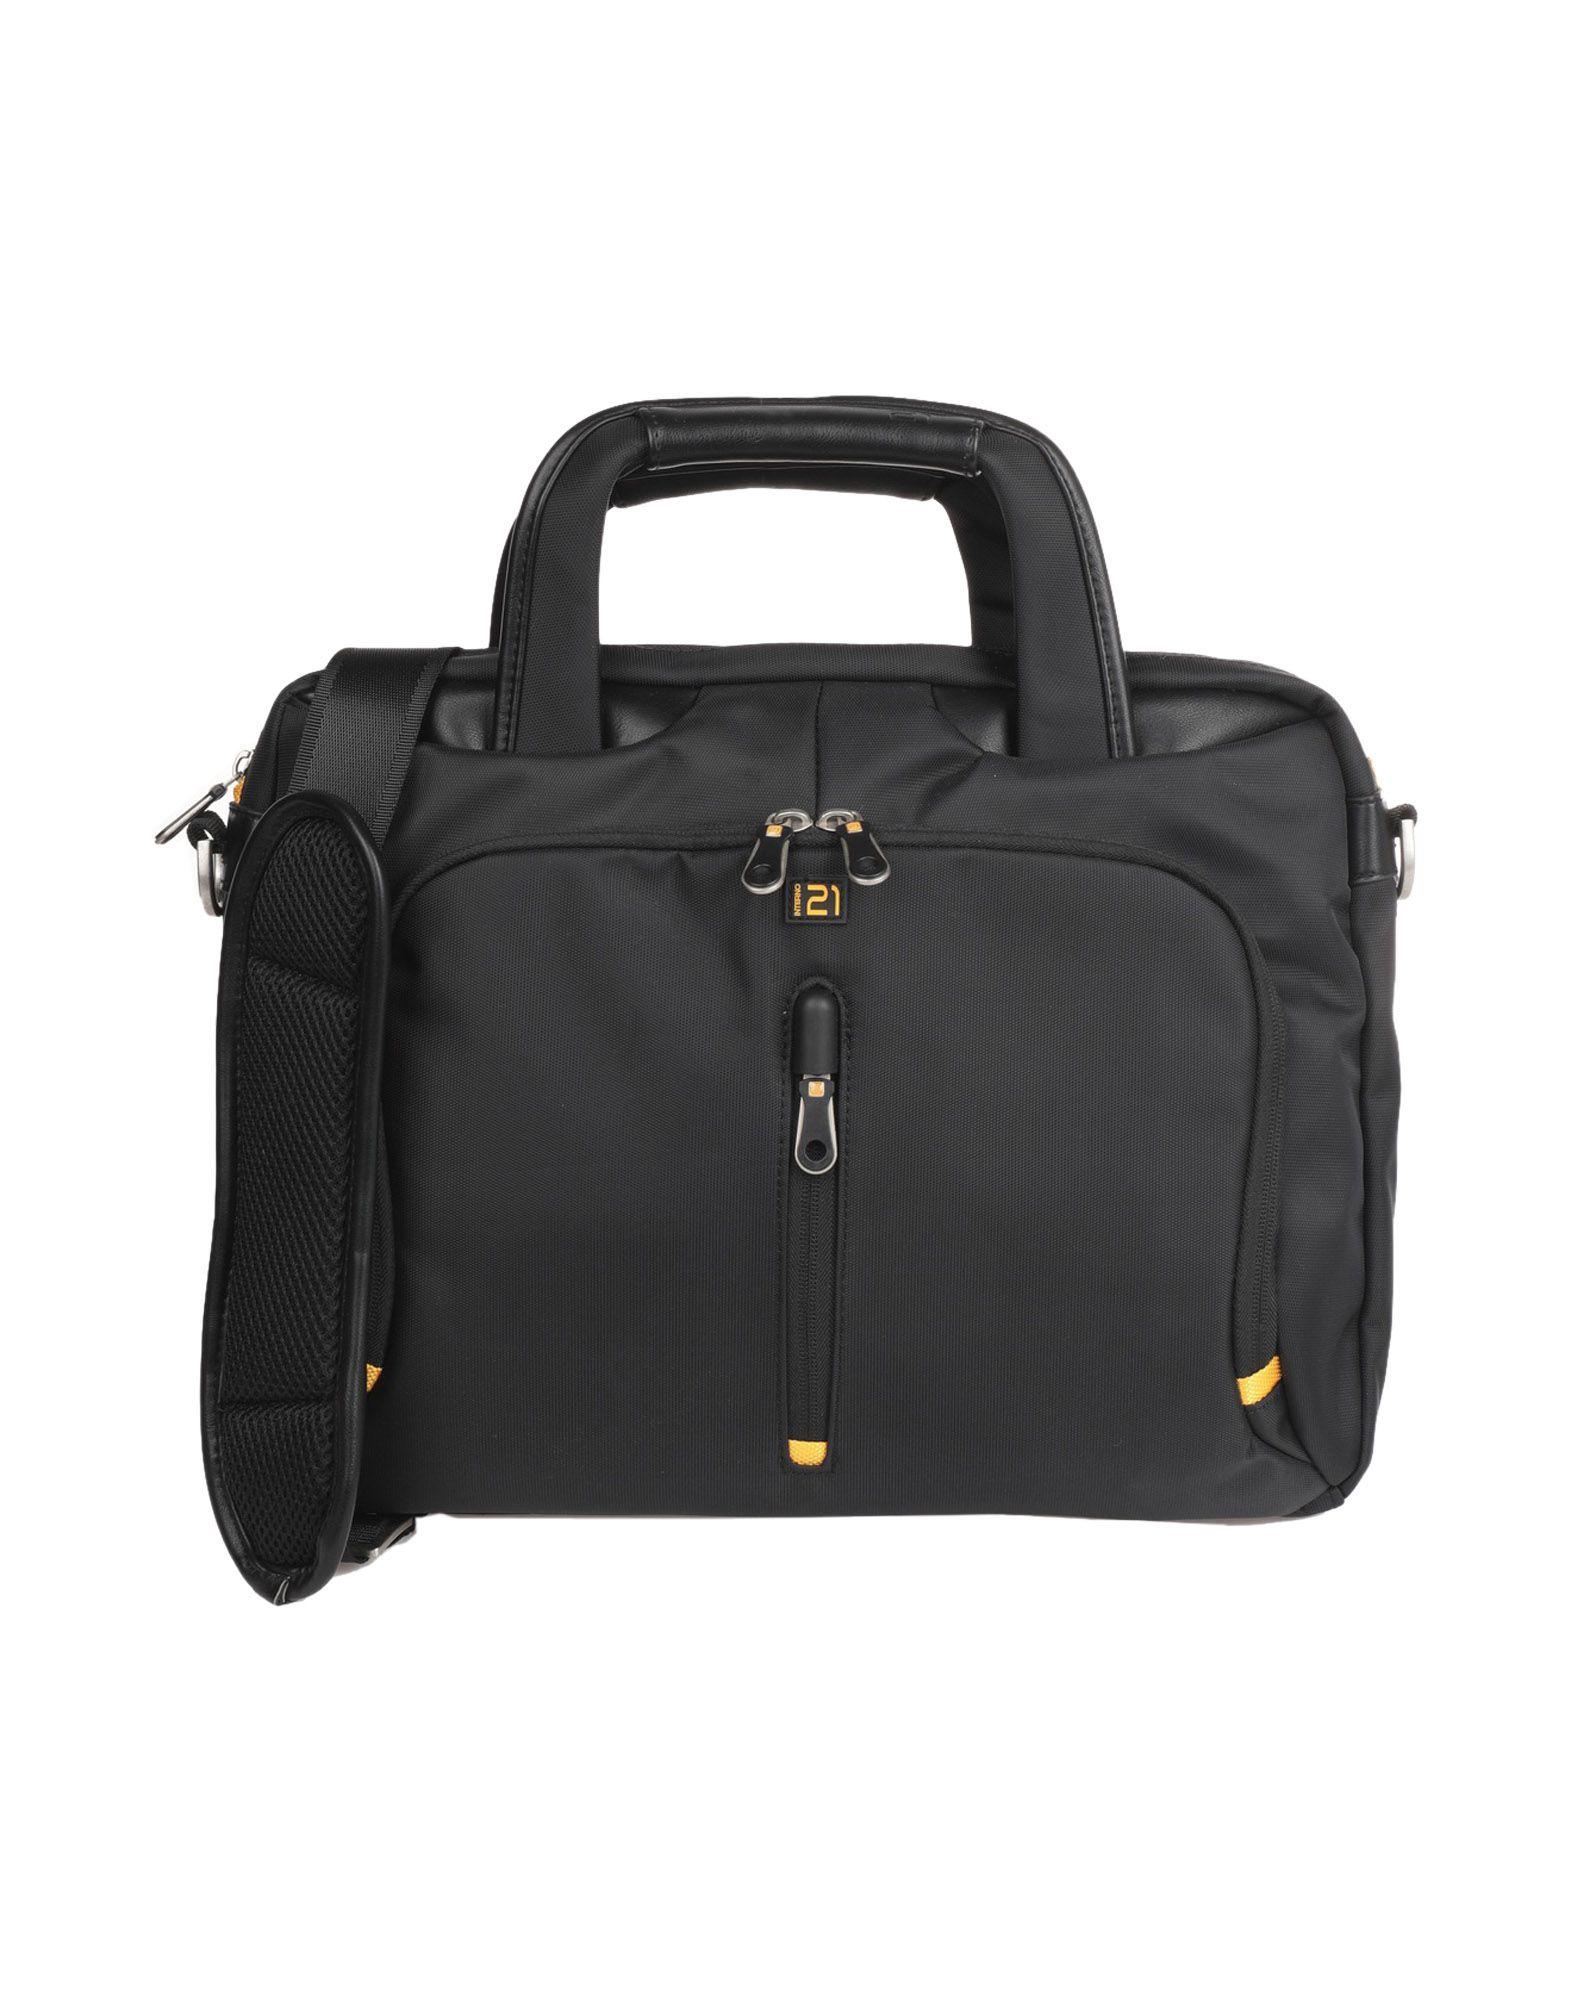 INTERNO 21® Деловые сумки сумка marina creazioni сумки деловые